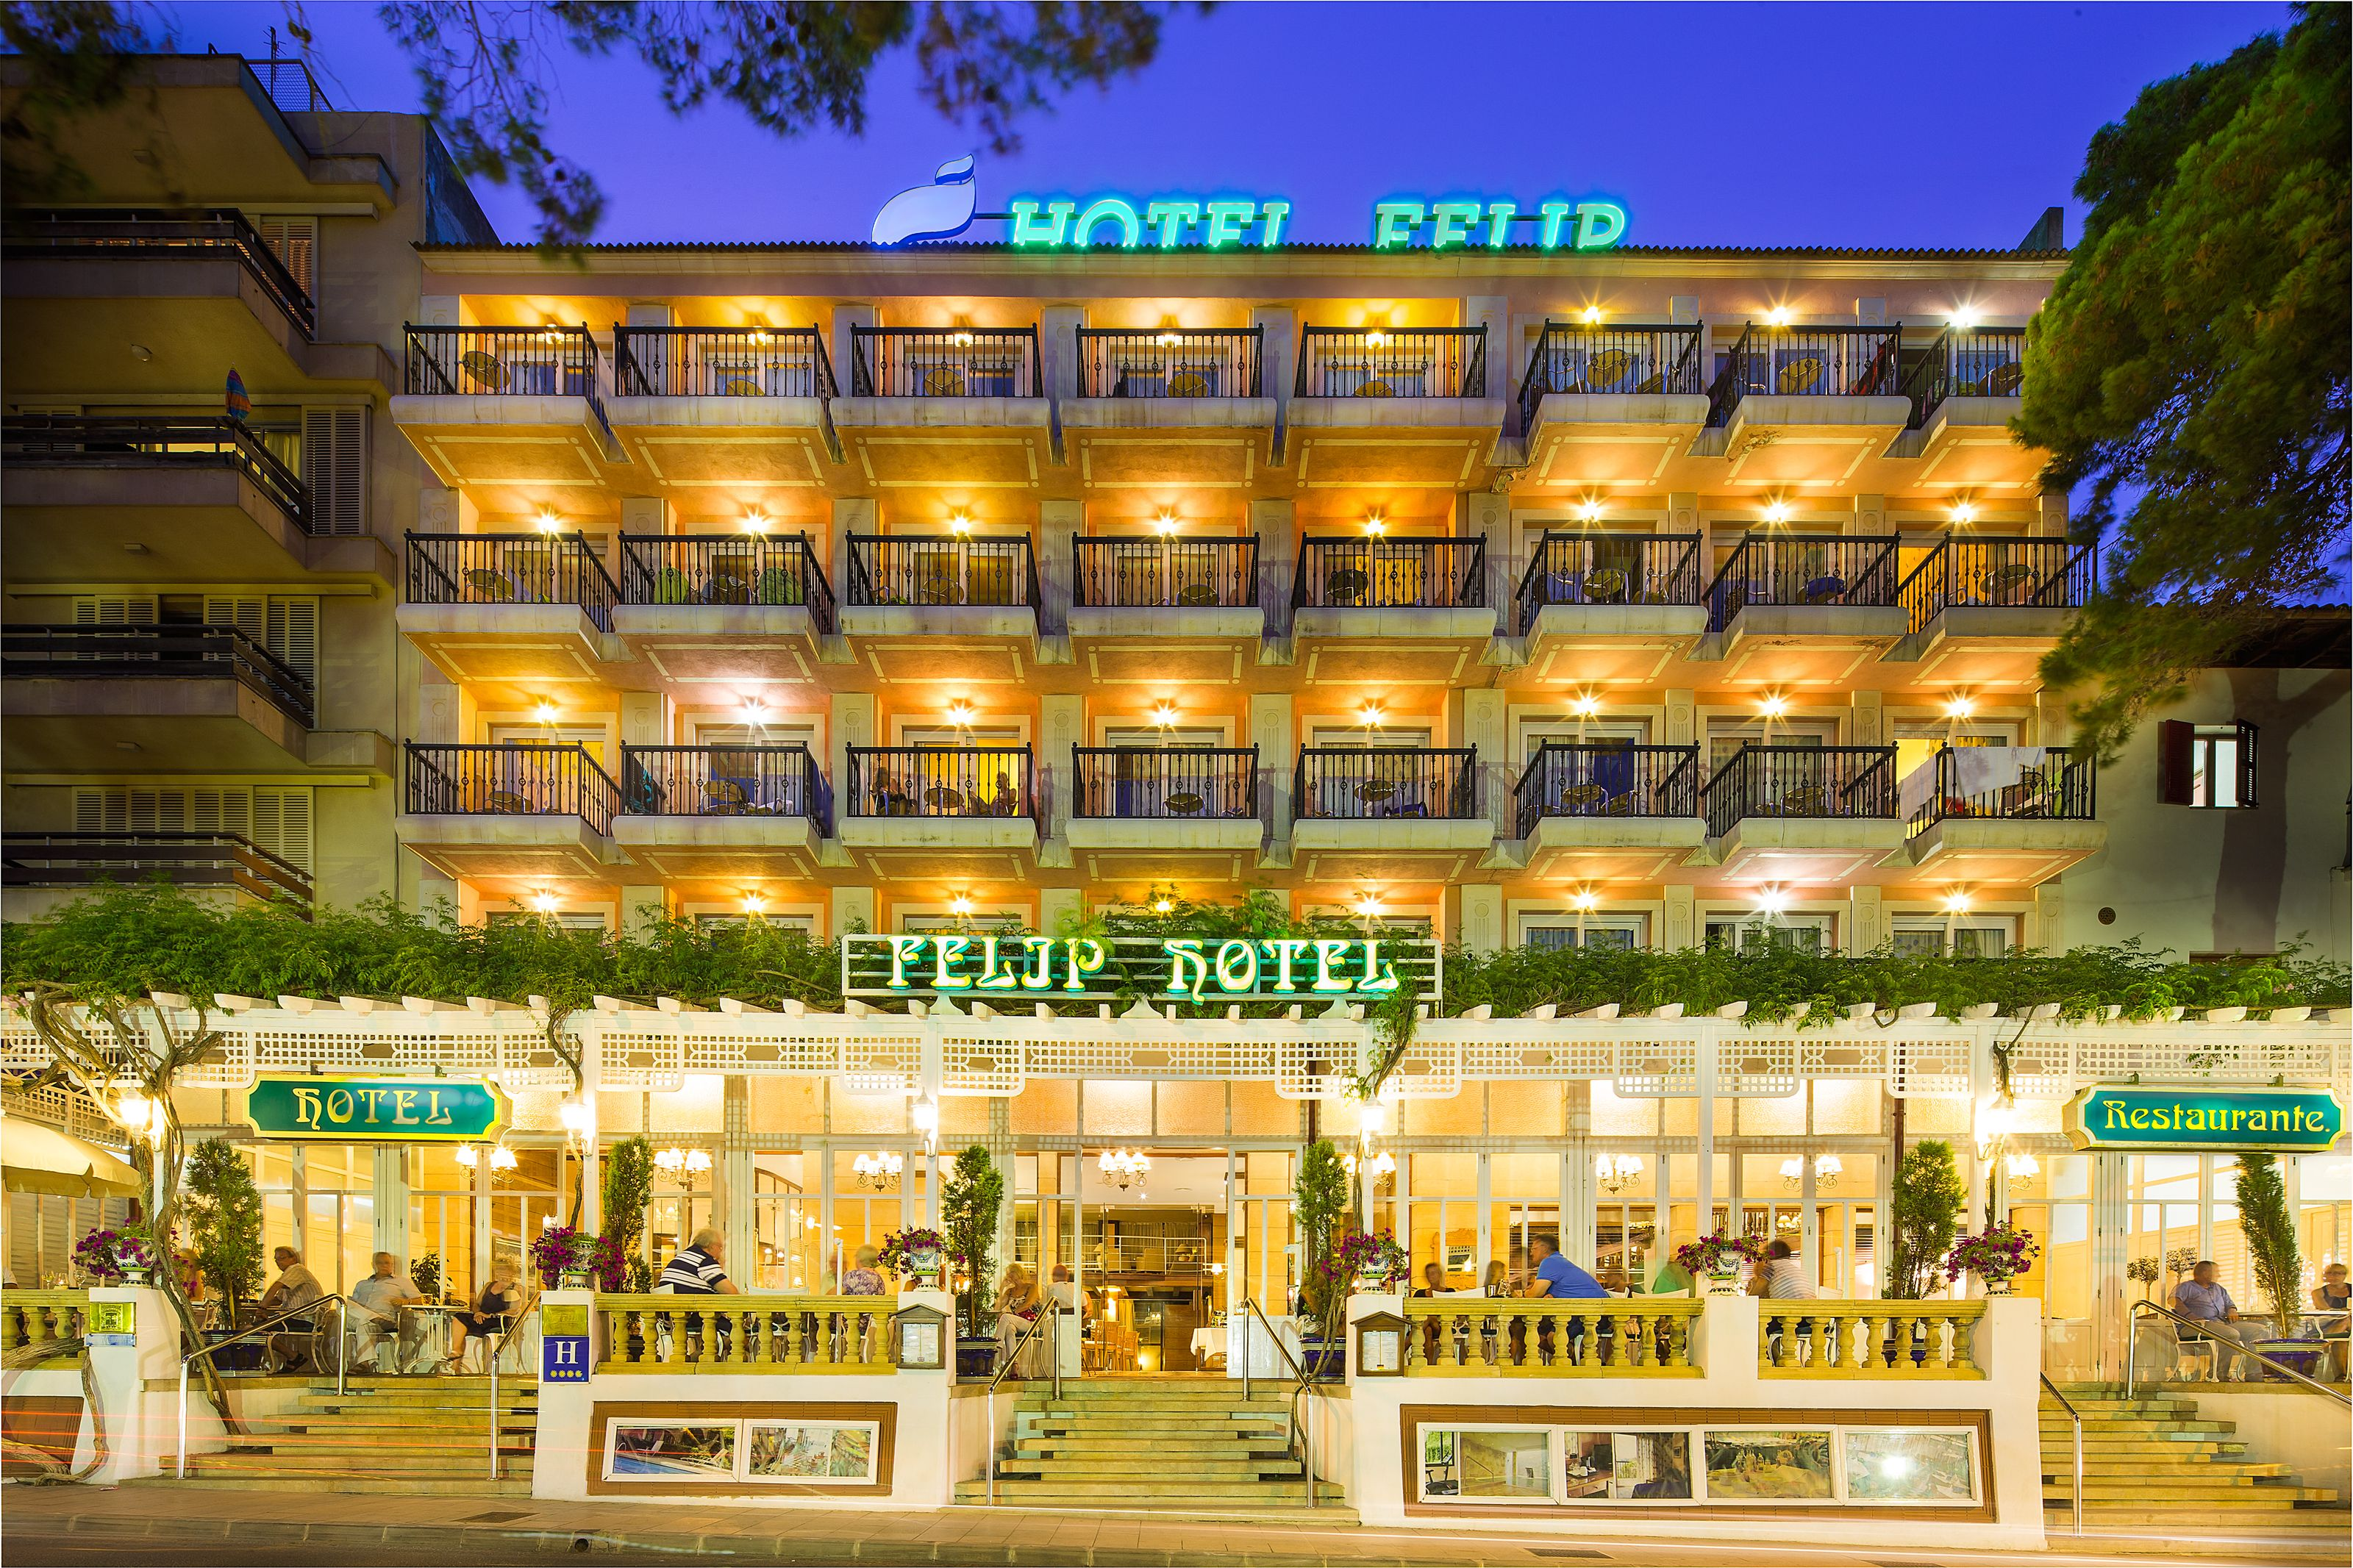 Hotel THB Felip Porto Cristo #seaview #holidays #vacaciones #Mallorca #Majorca #Majorque #hotel #hotels #hoteles